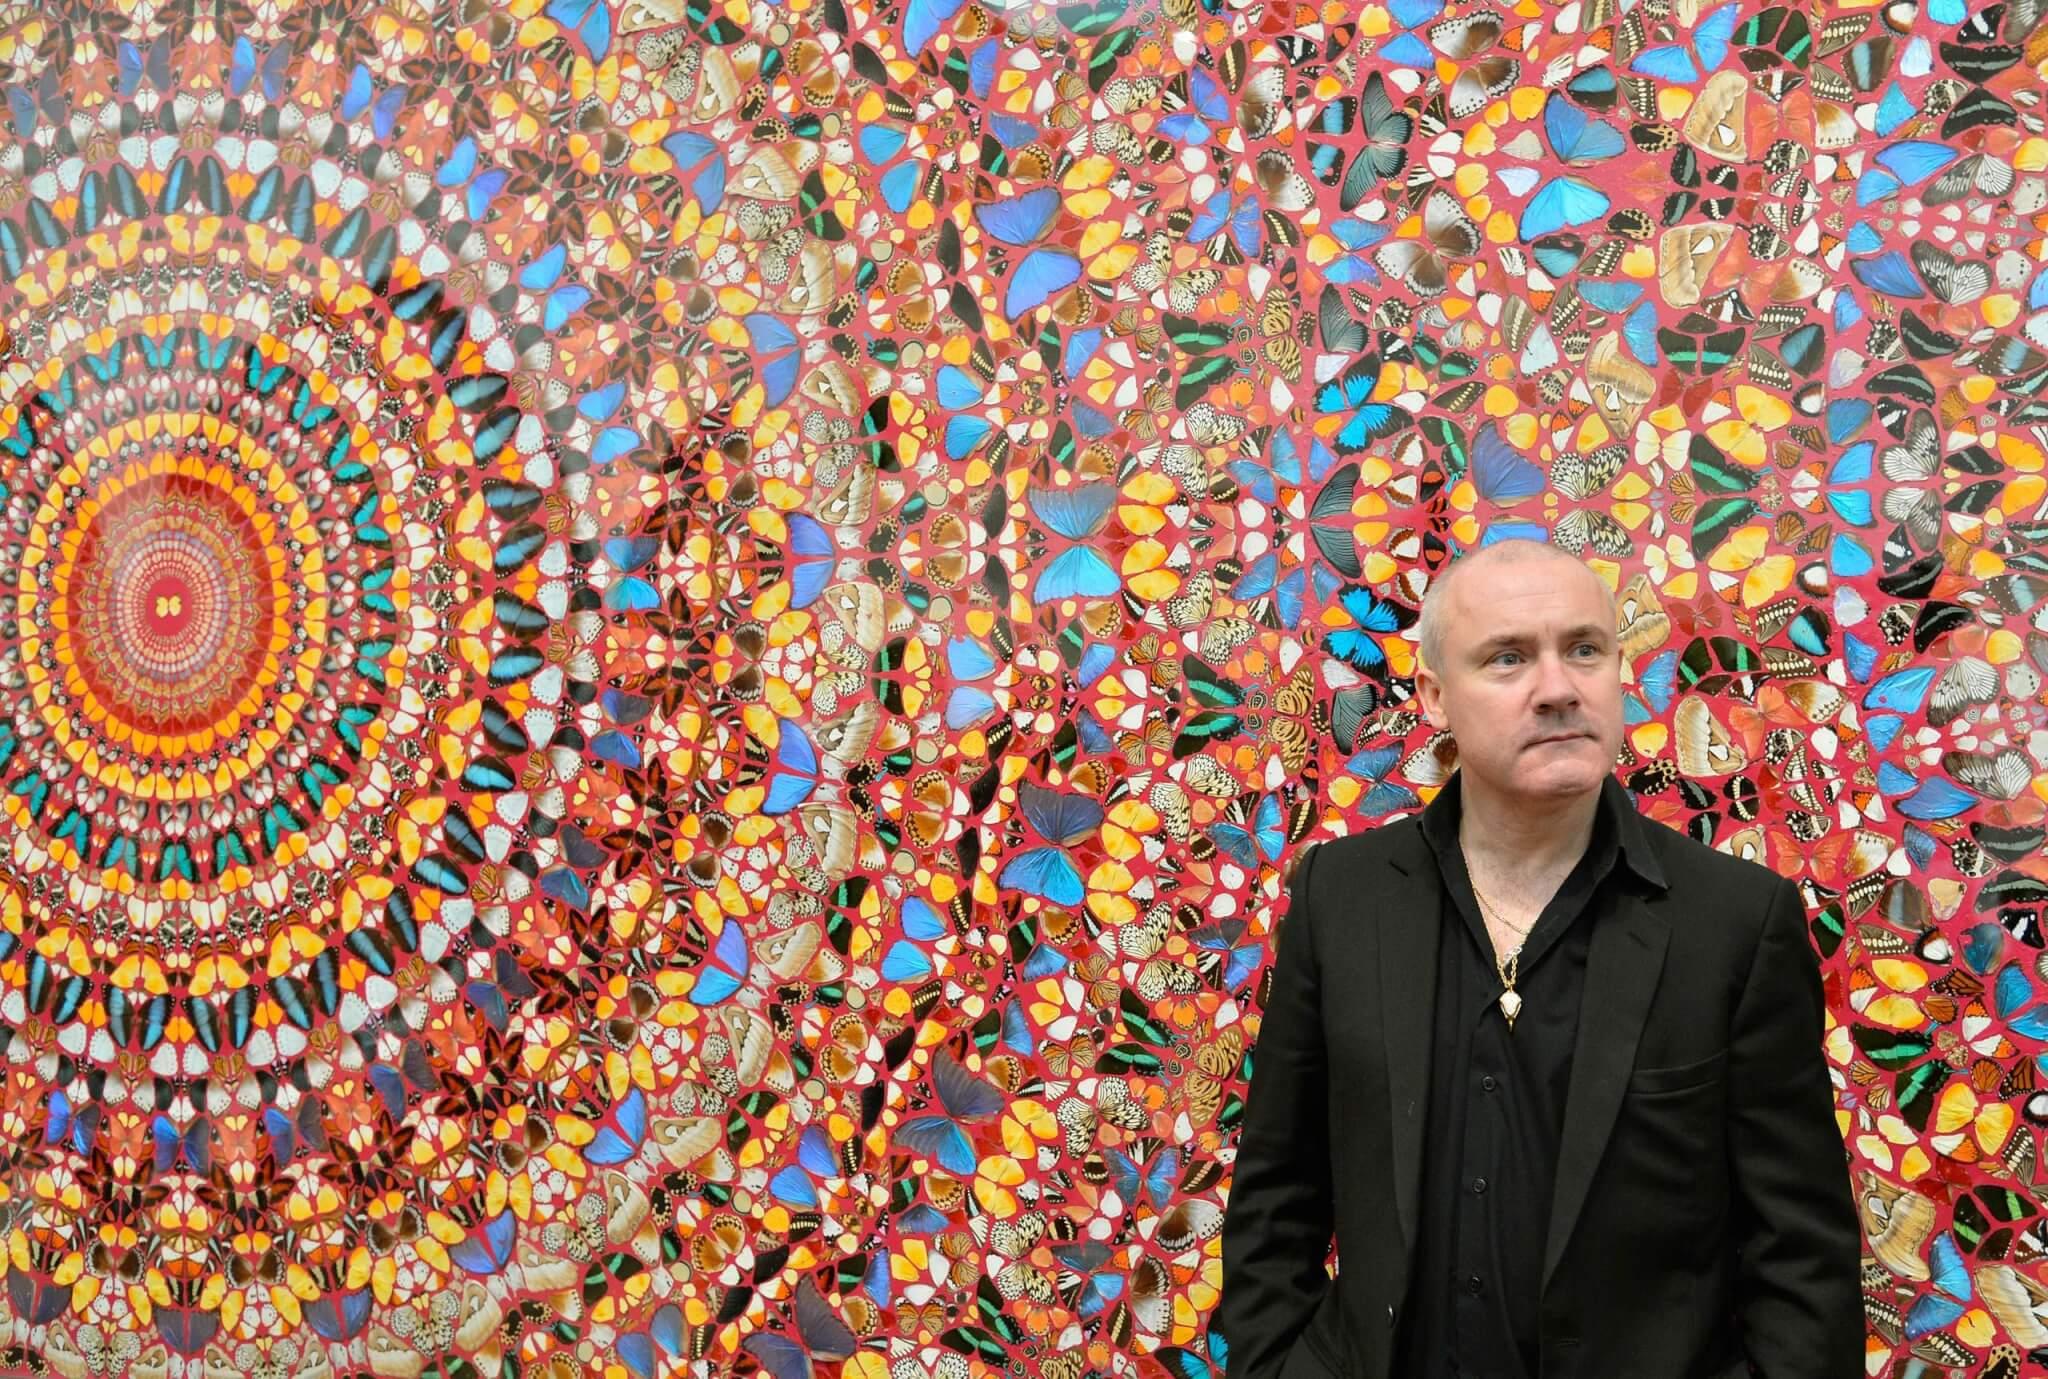 藝術家Damien Hirst